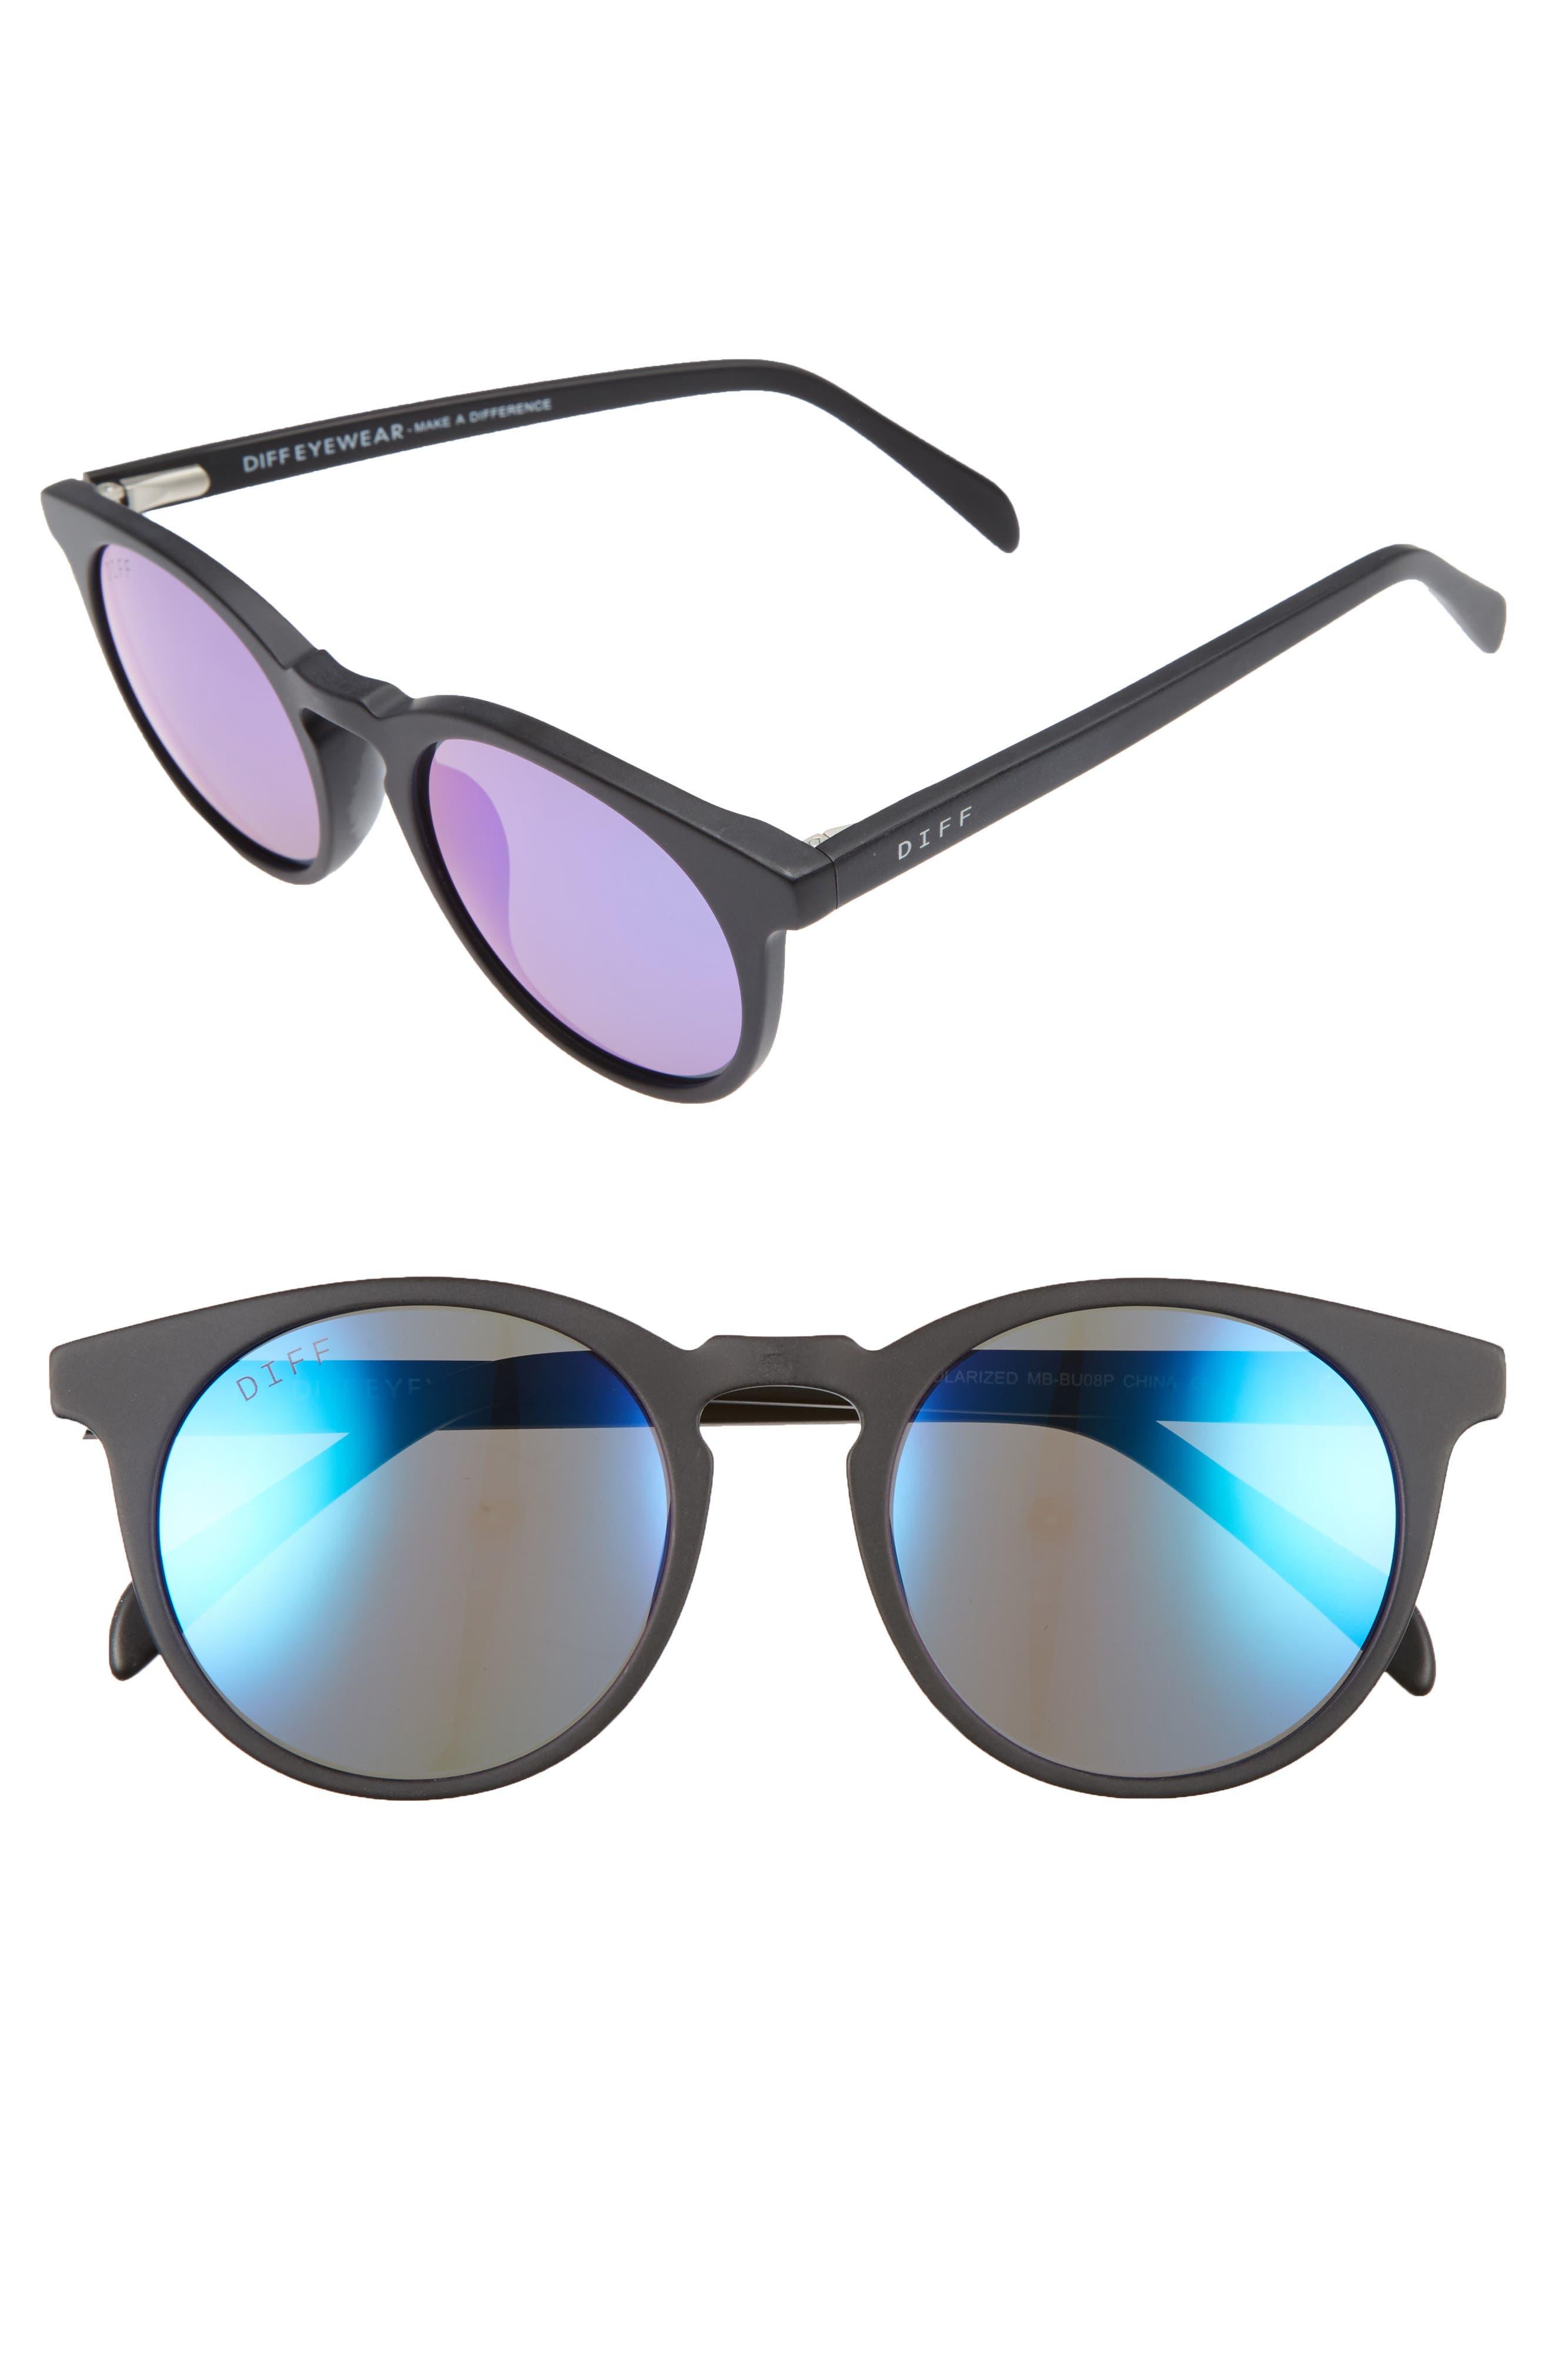 Charlie 48mm Mirrored Polarized Round Retro Sunglasses,                             Main thumbnail 1, color,                             001